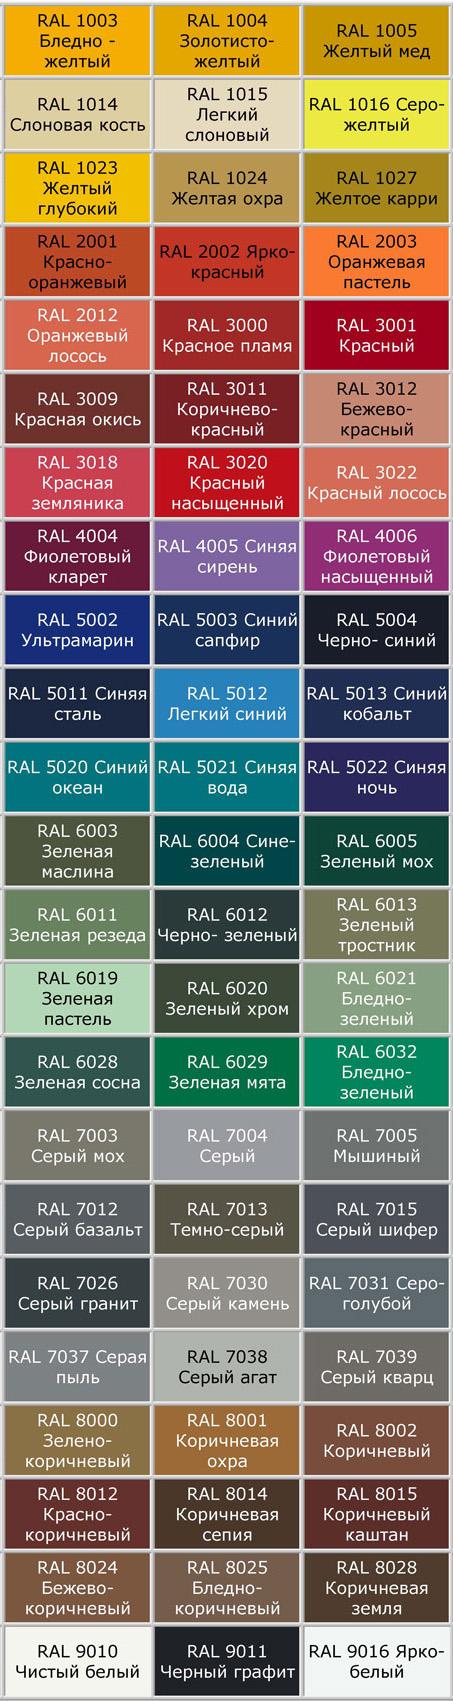 Подбор цвета для покраски дисков